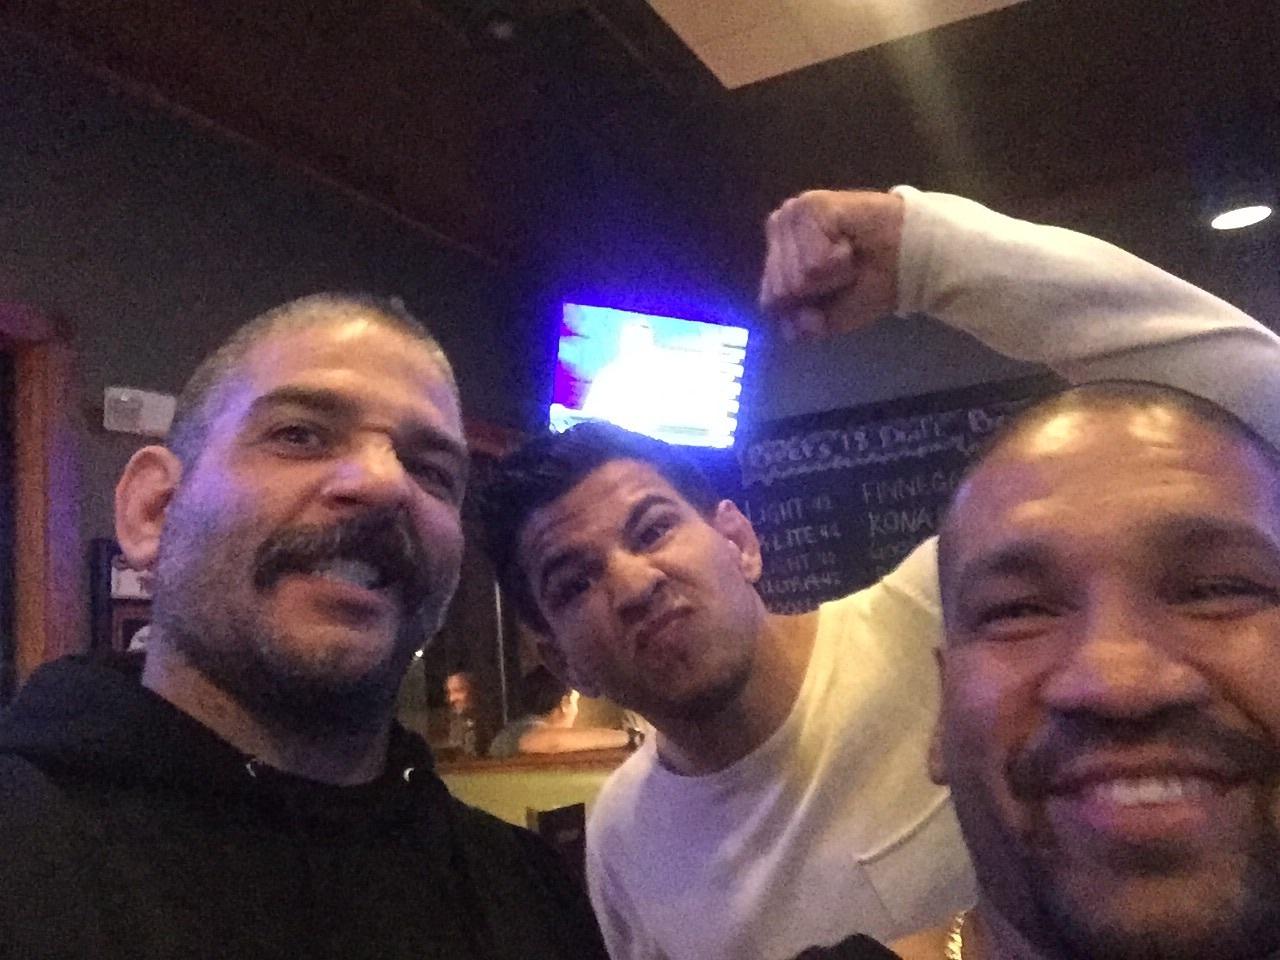 Casey Halstead, Matthew Lopez and Danny Perez